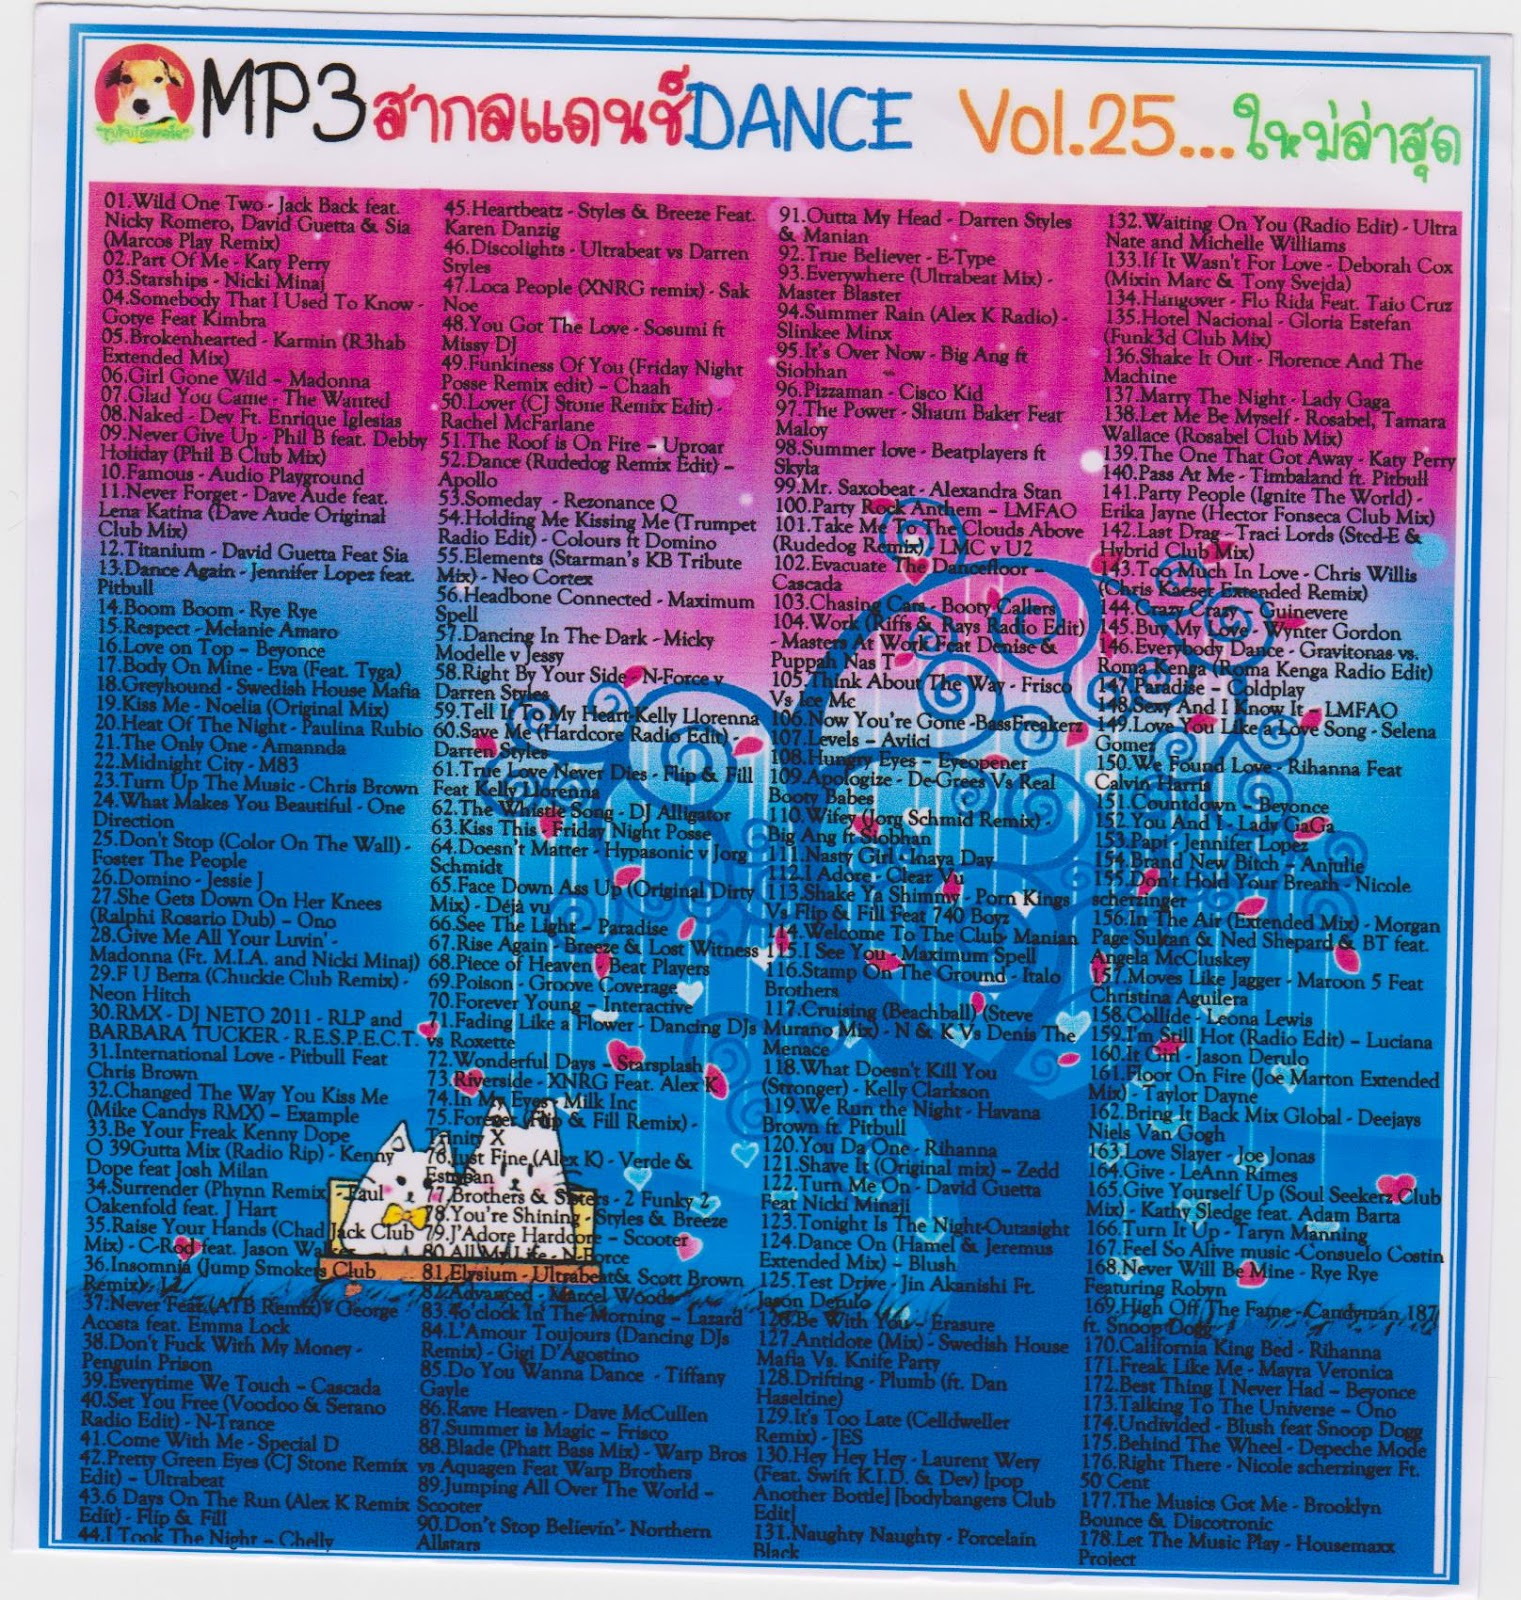 Download [Mp3]-[Dance Inter] เพลงสากลแดนช์ ใน DANCE VOL 25 มากถึง 178 เพลง 4shared By Pleng-mun.com